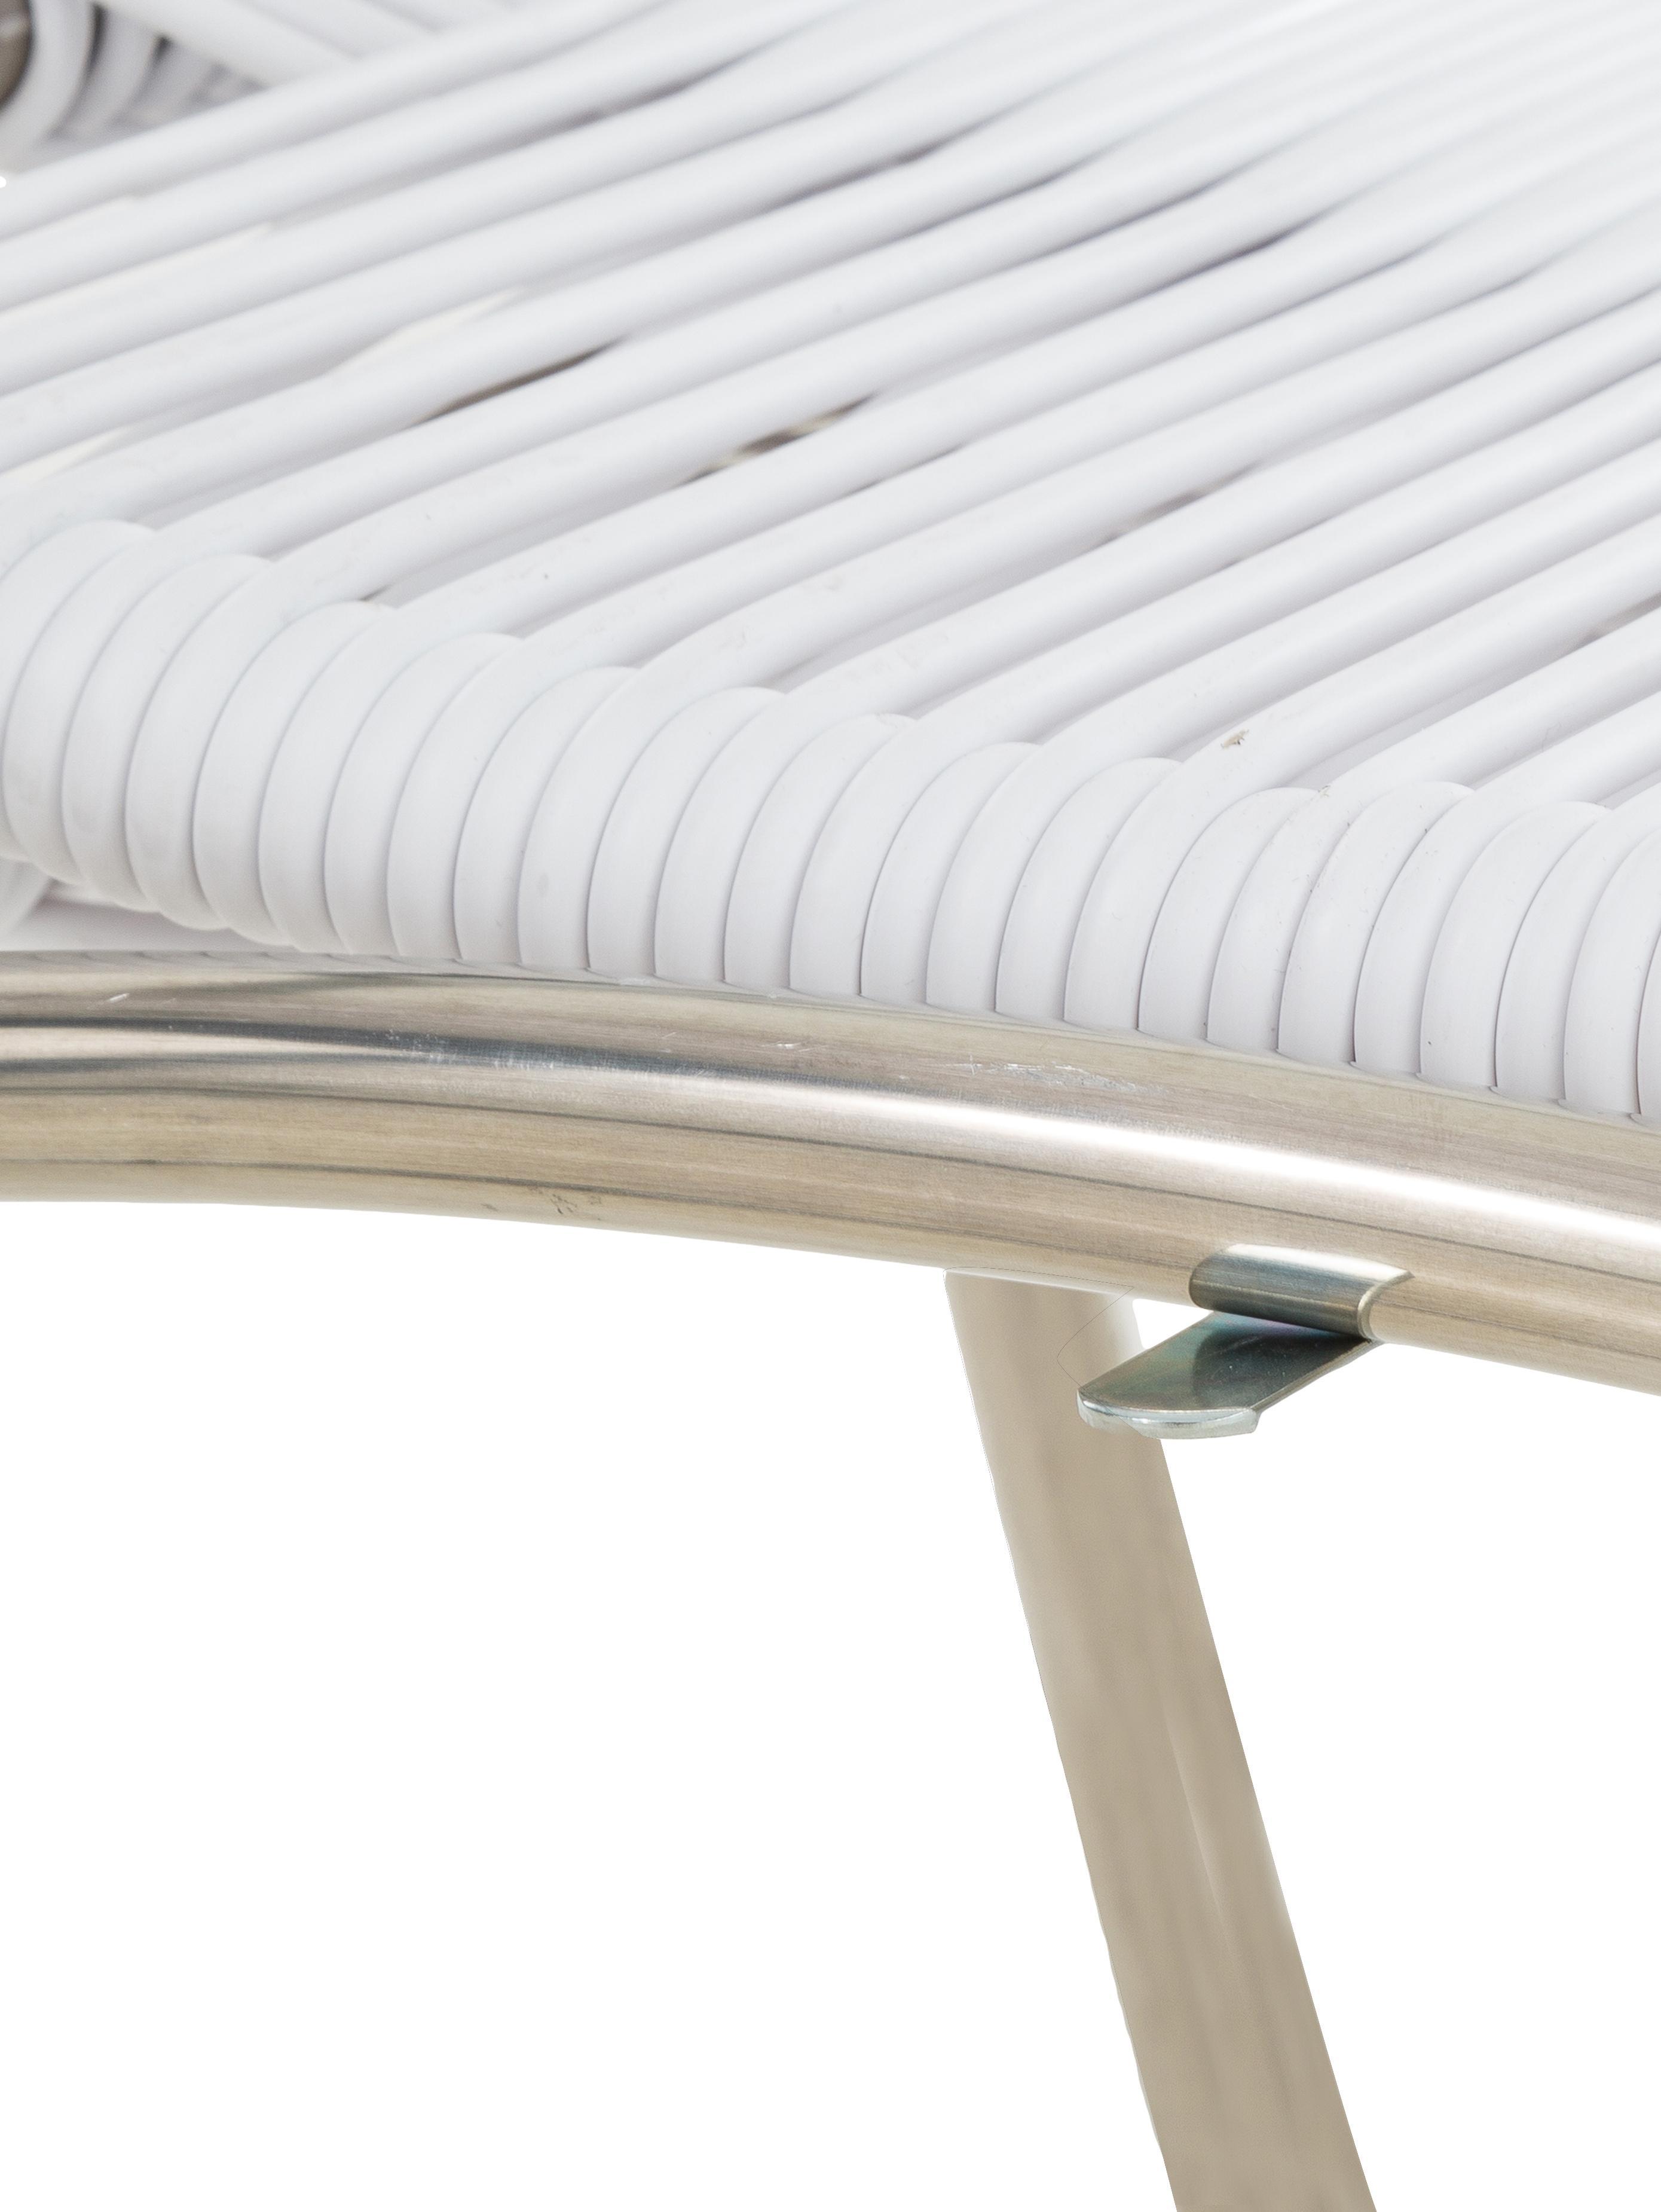 Garten-Liegestuhl Spaghetti mit Fußstütze, Gestell: Aluminium, Weiß, B 60 x T 48 cm